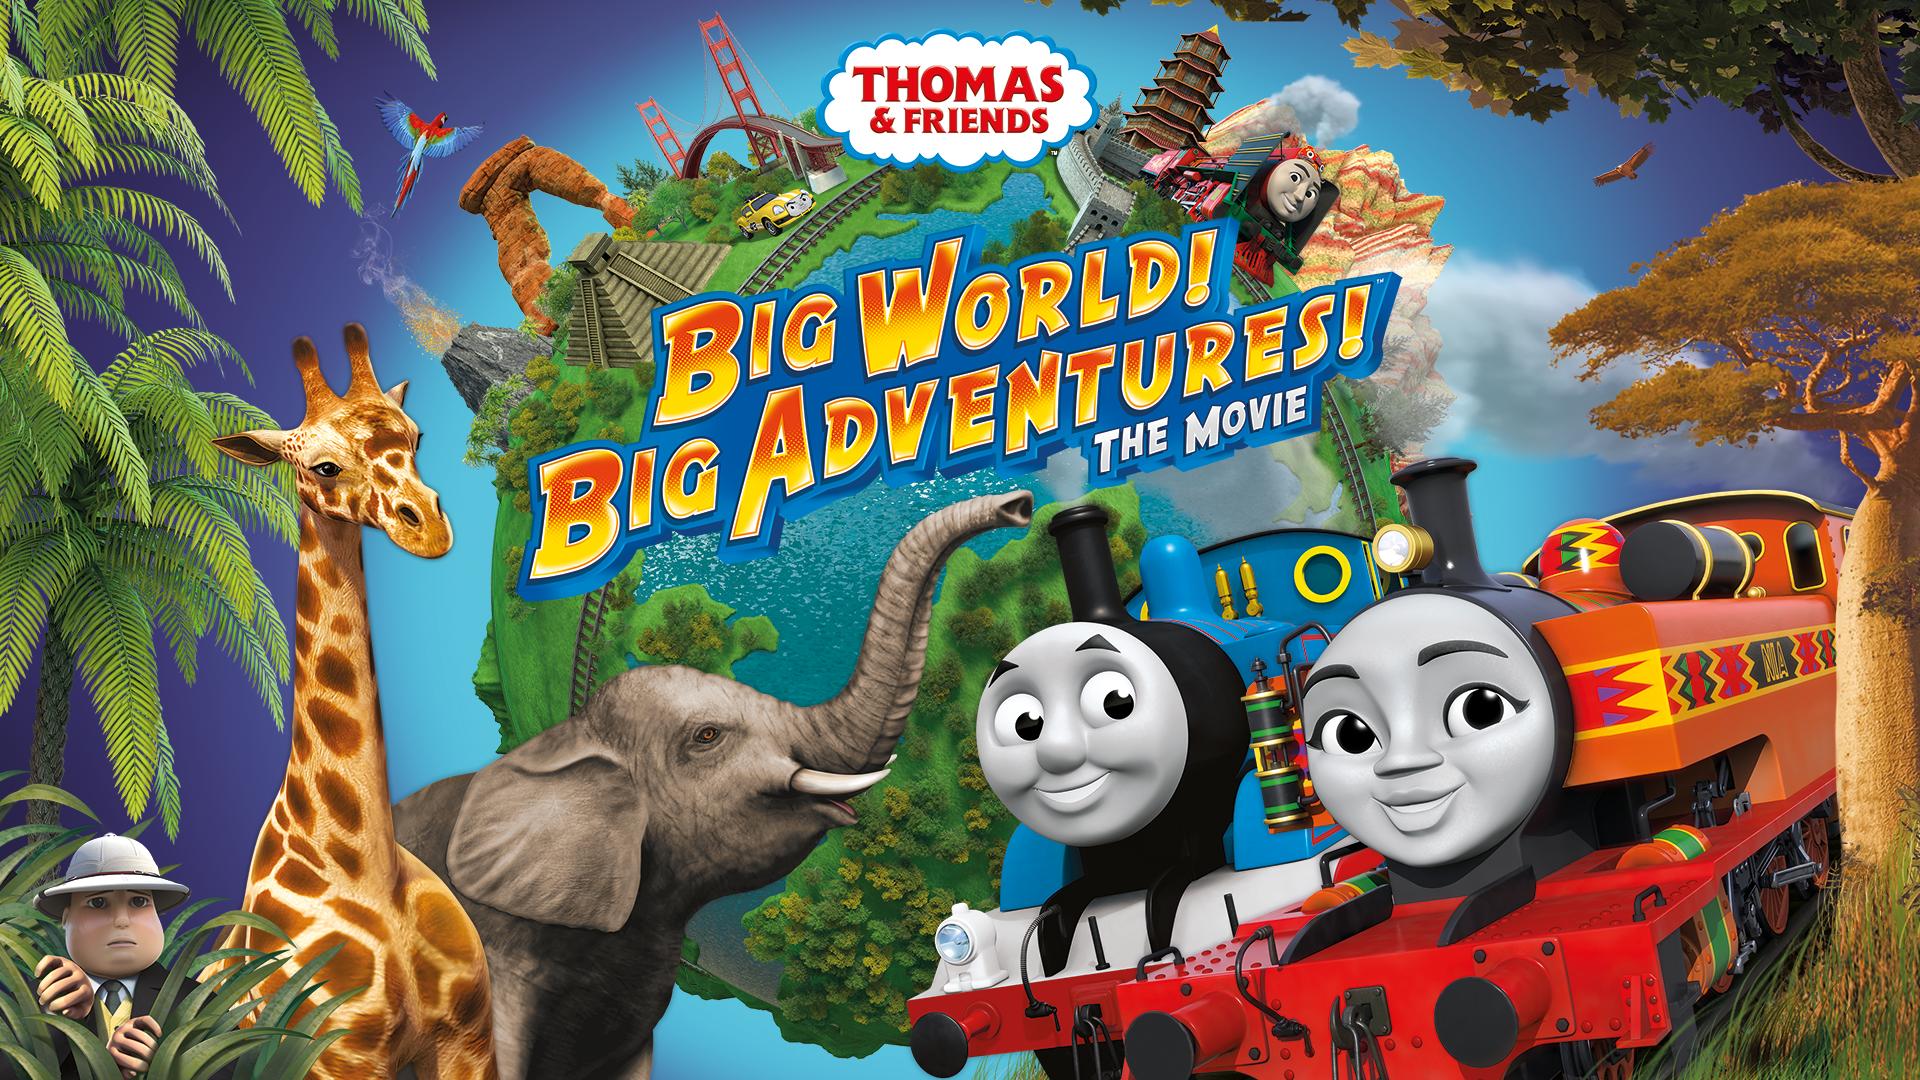 Thomas & Friends: Big World! Big Adventures! - The Movie (US)